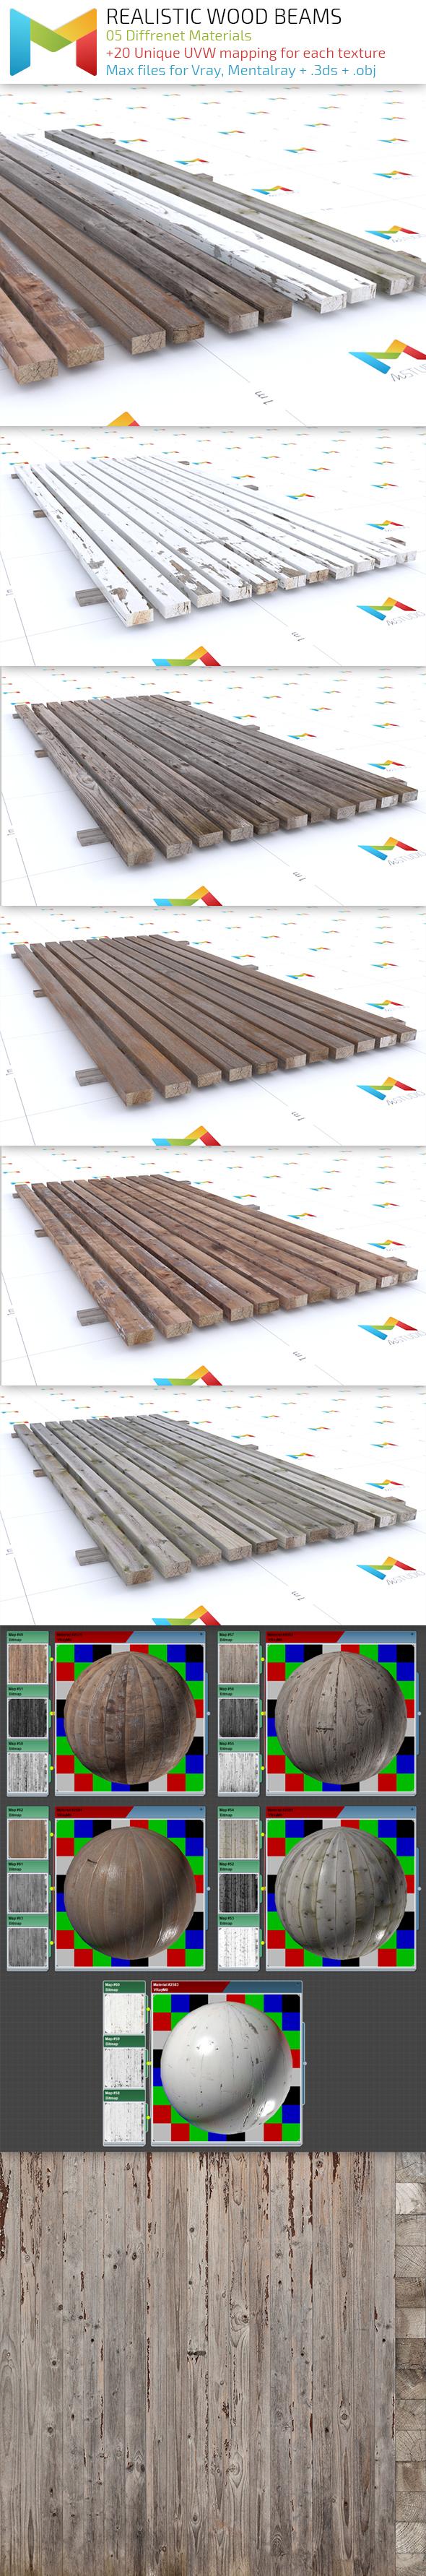 Realistic Wood Beams - 3DOcean Item for Sale